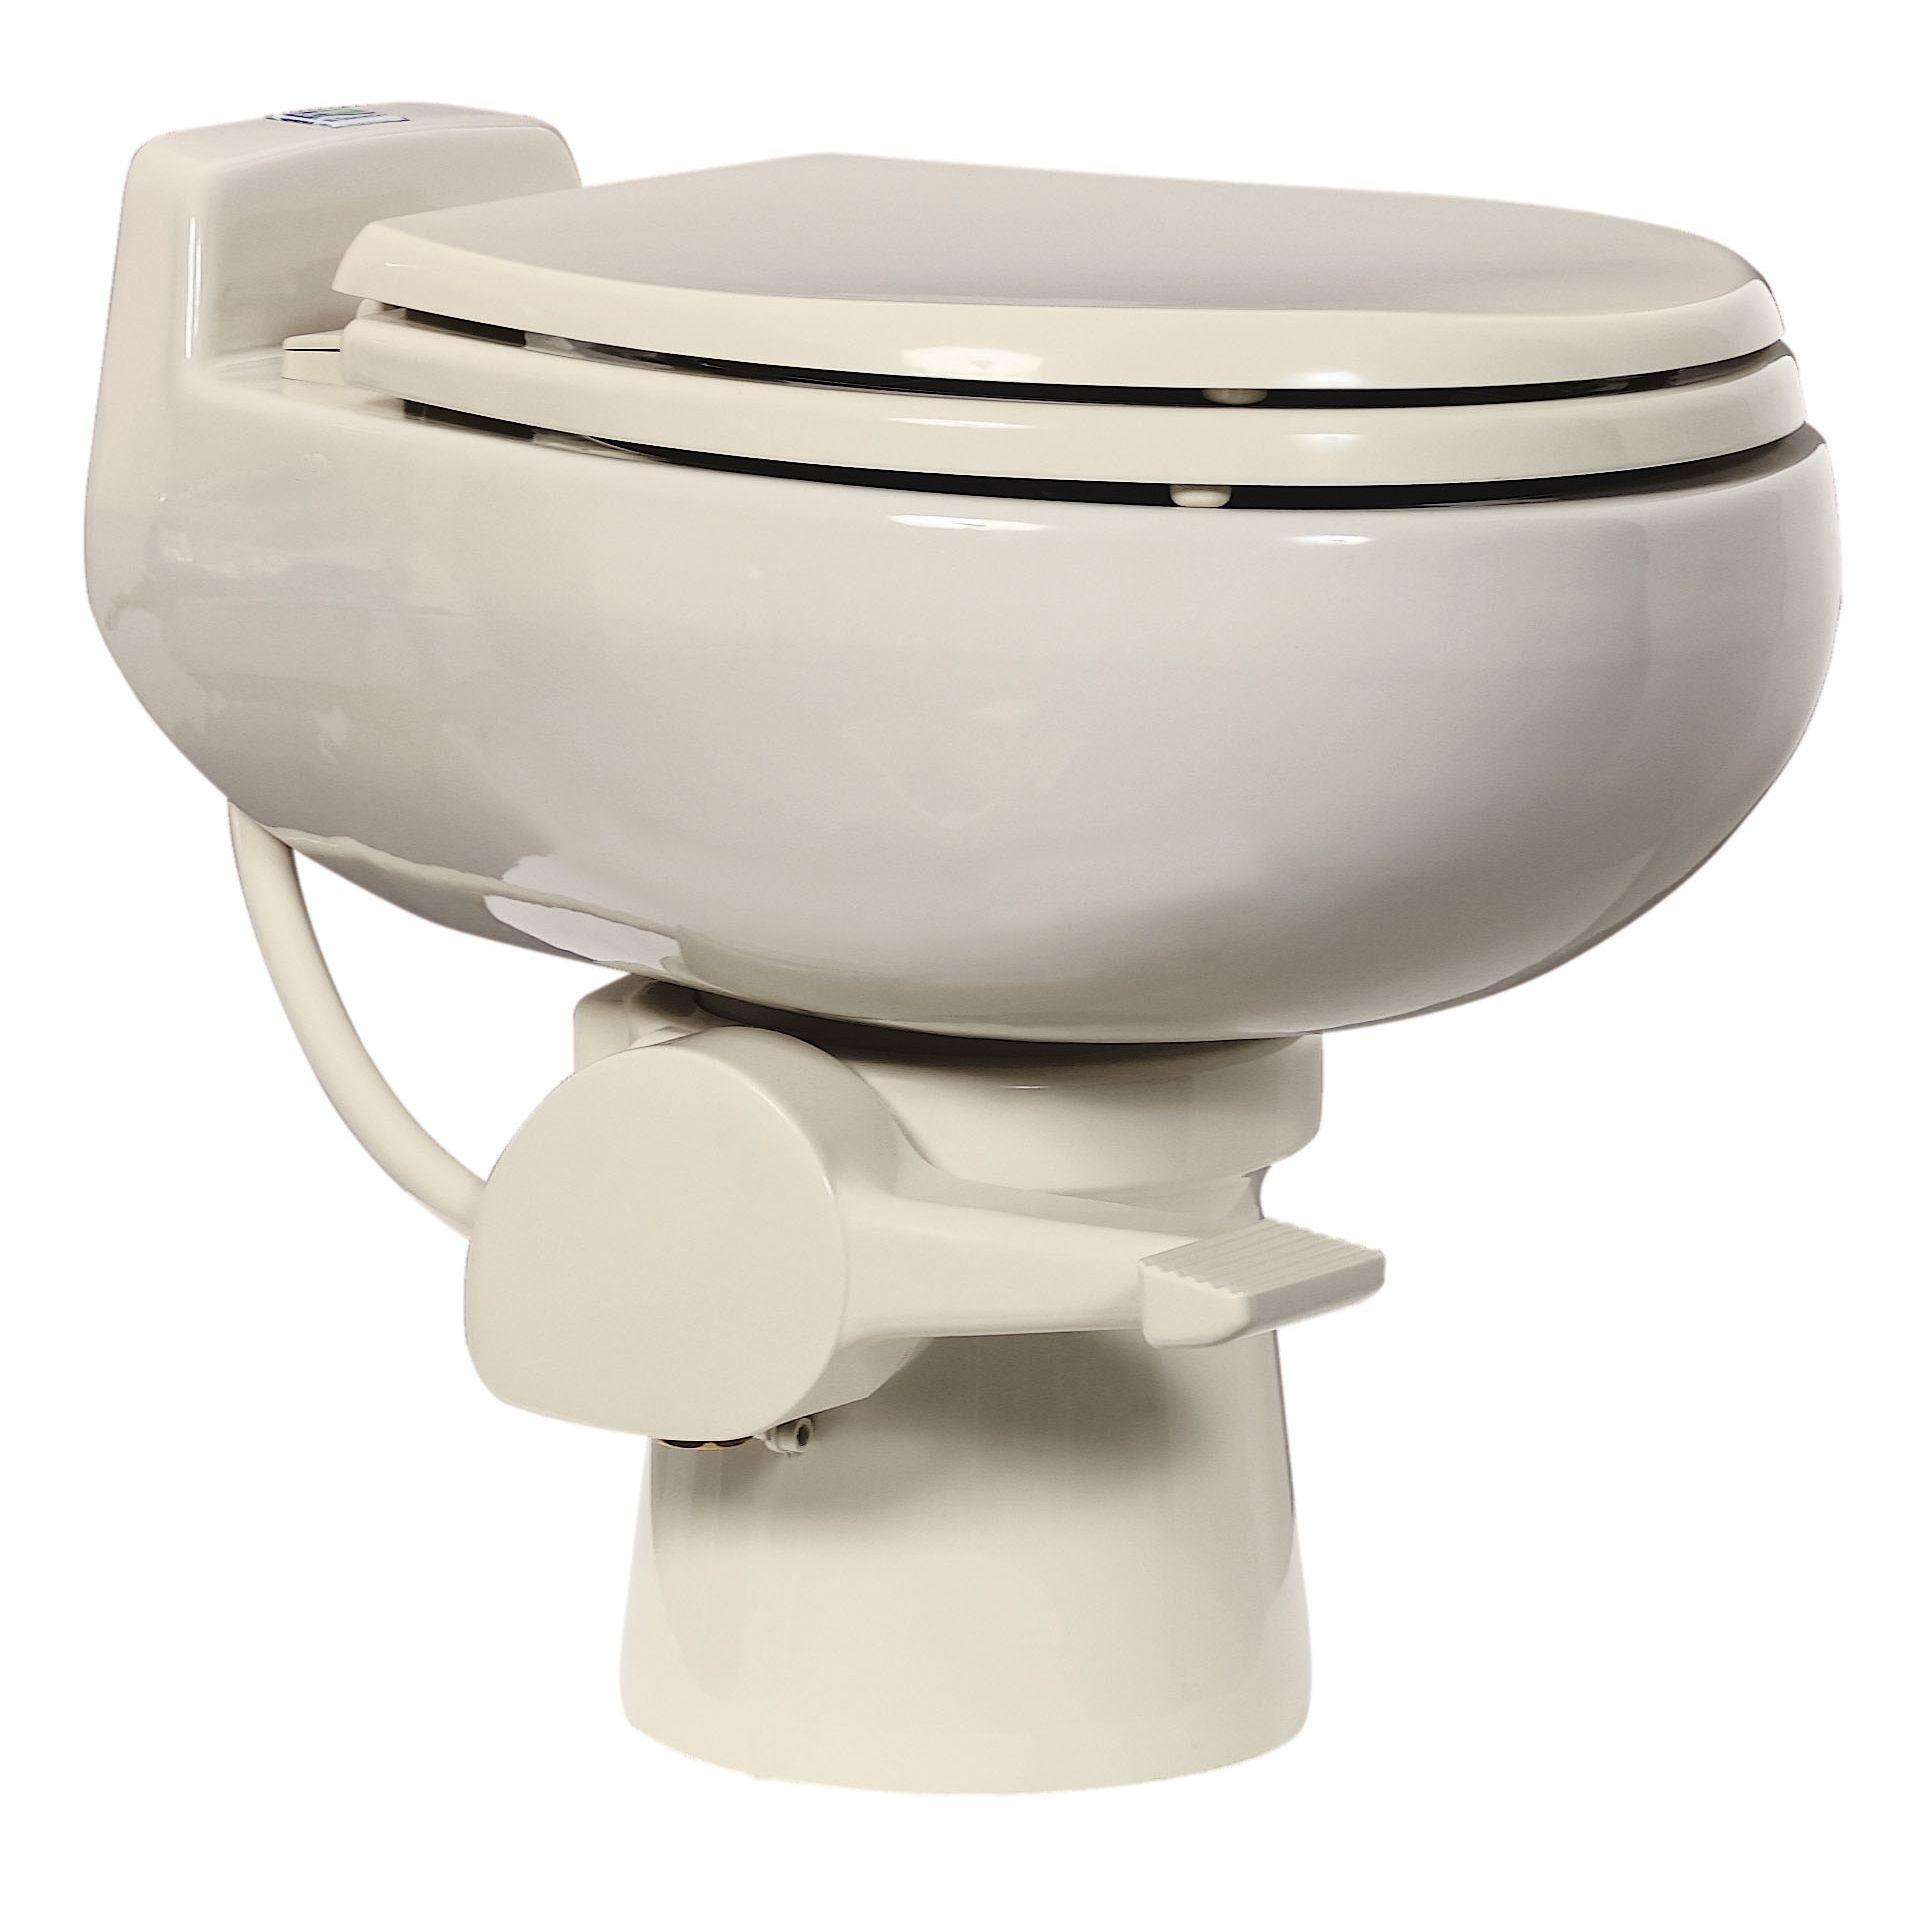 Sealand 510+ One Pint Flush Toilet - Bone